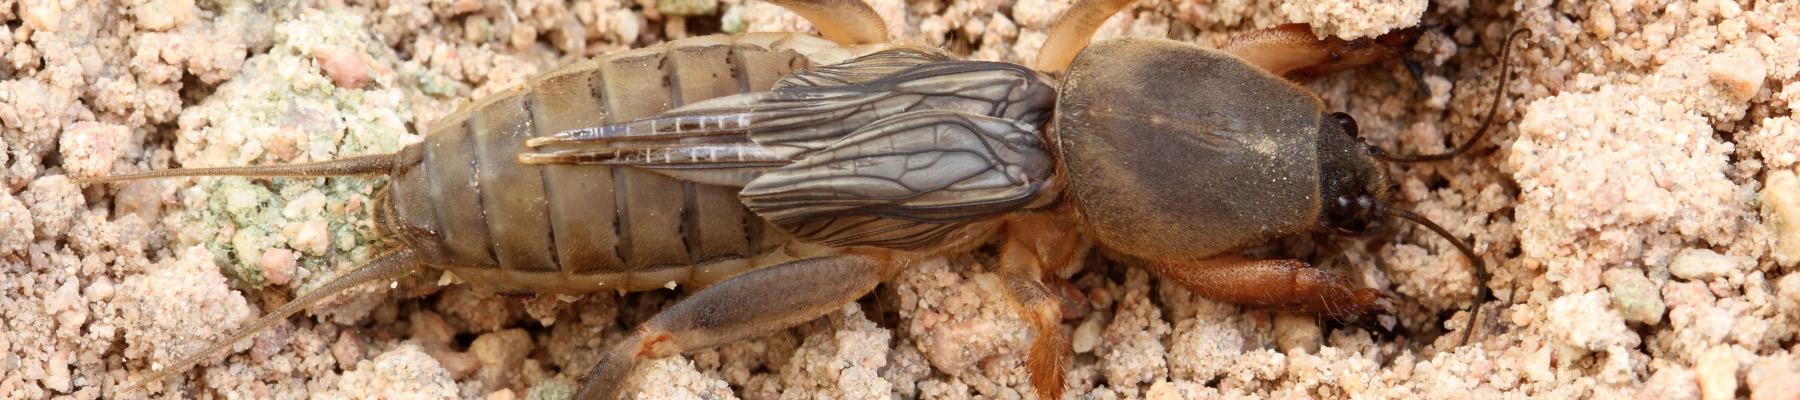 Mole Crickets problem in sc